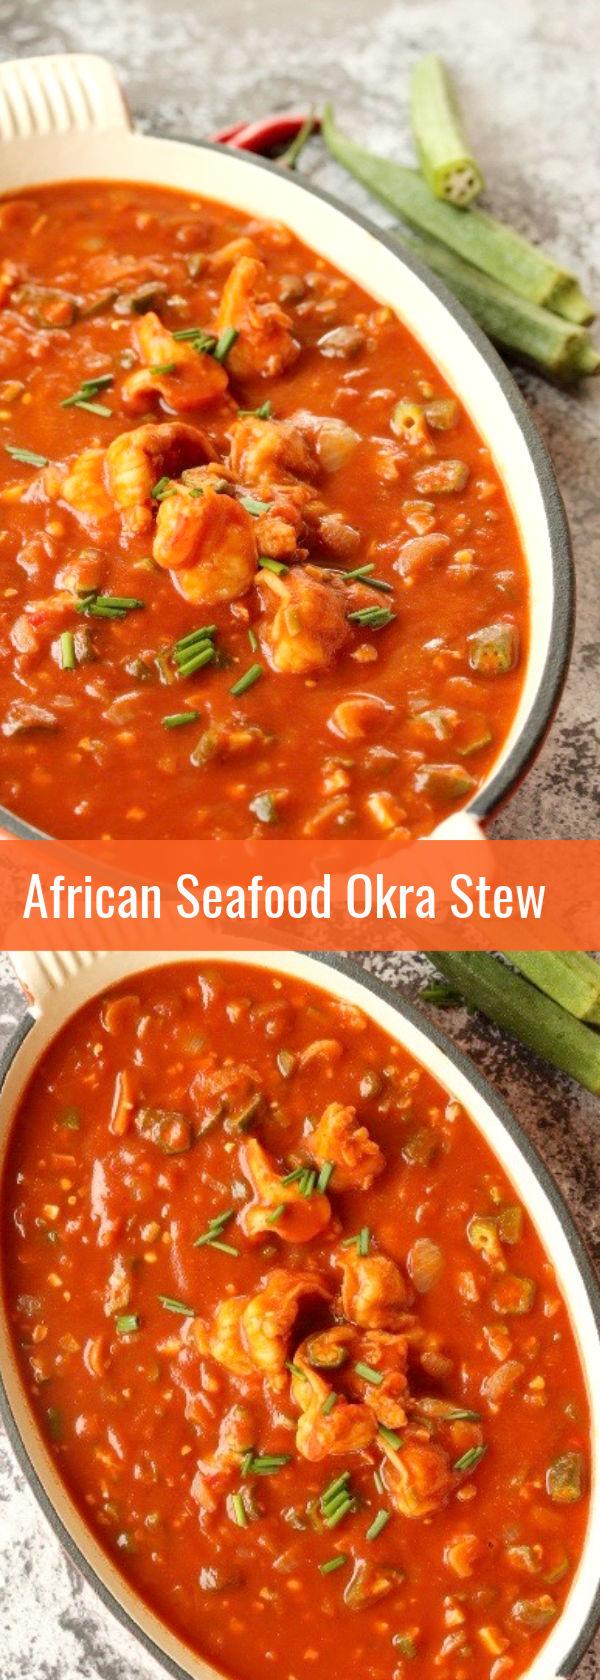 african_seafood_okra_stew